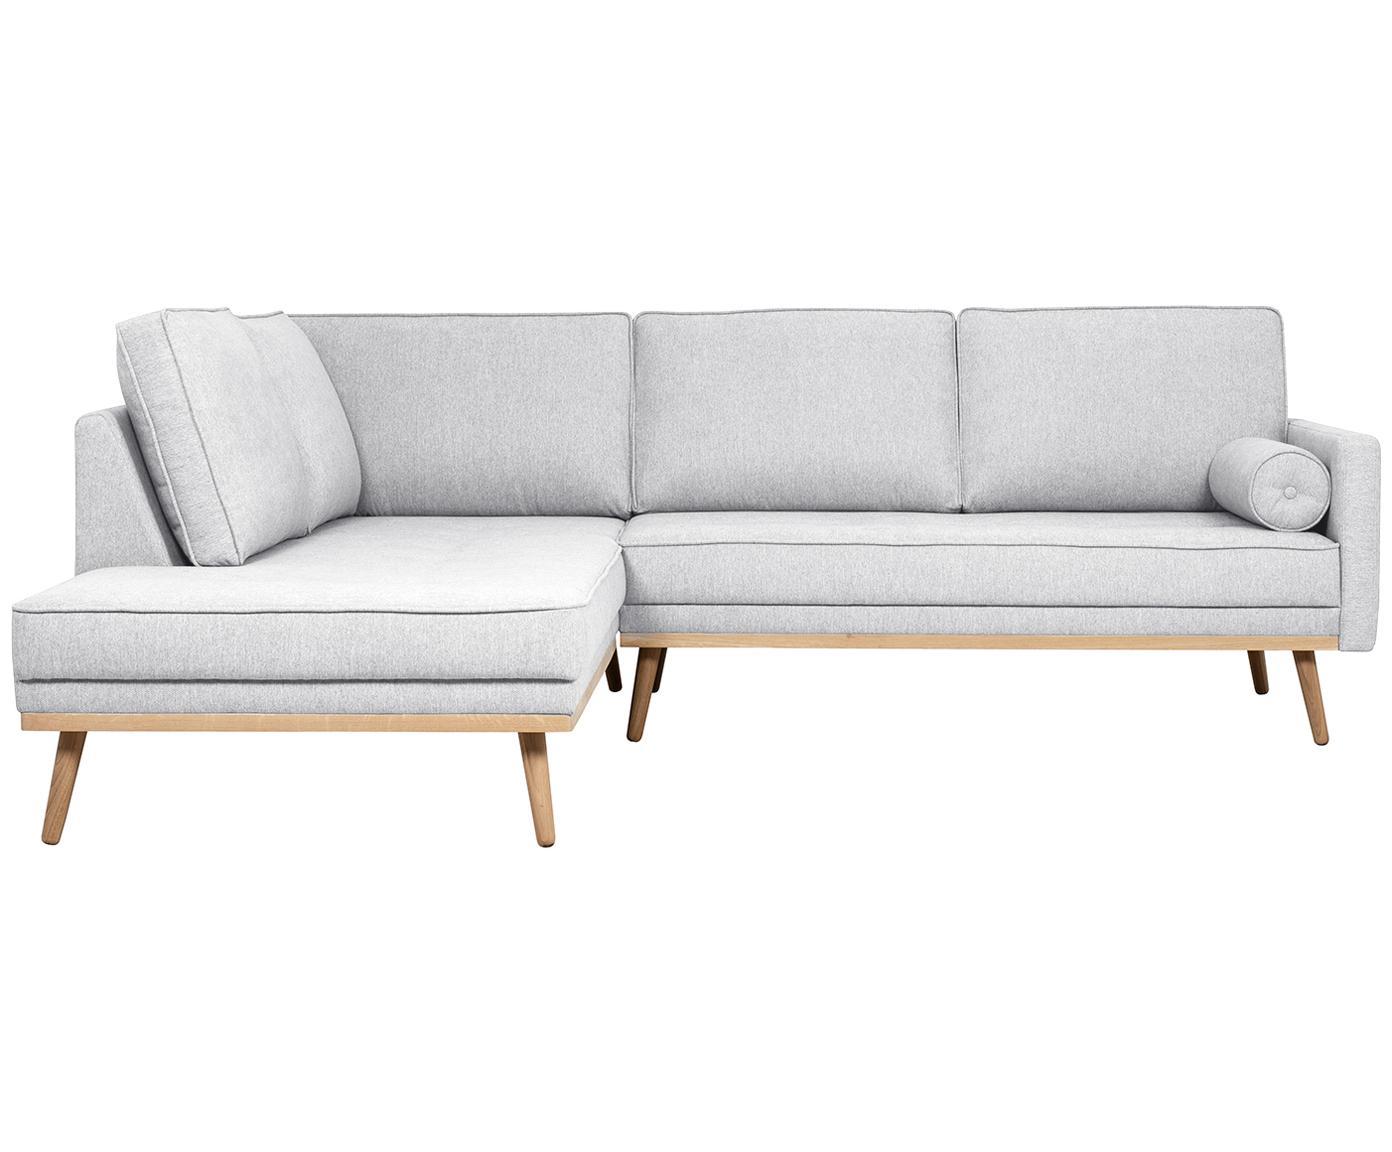 Hoekbank Saint (3-zits), Bekleding: polyester, Frame: massief grenenhout, spaan, Lichtgrijs, 243 x 70 cm